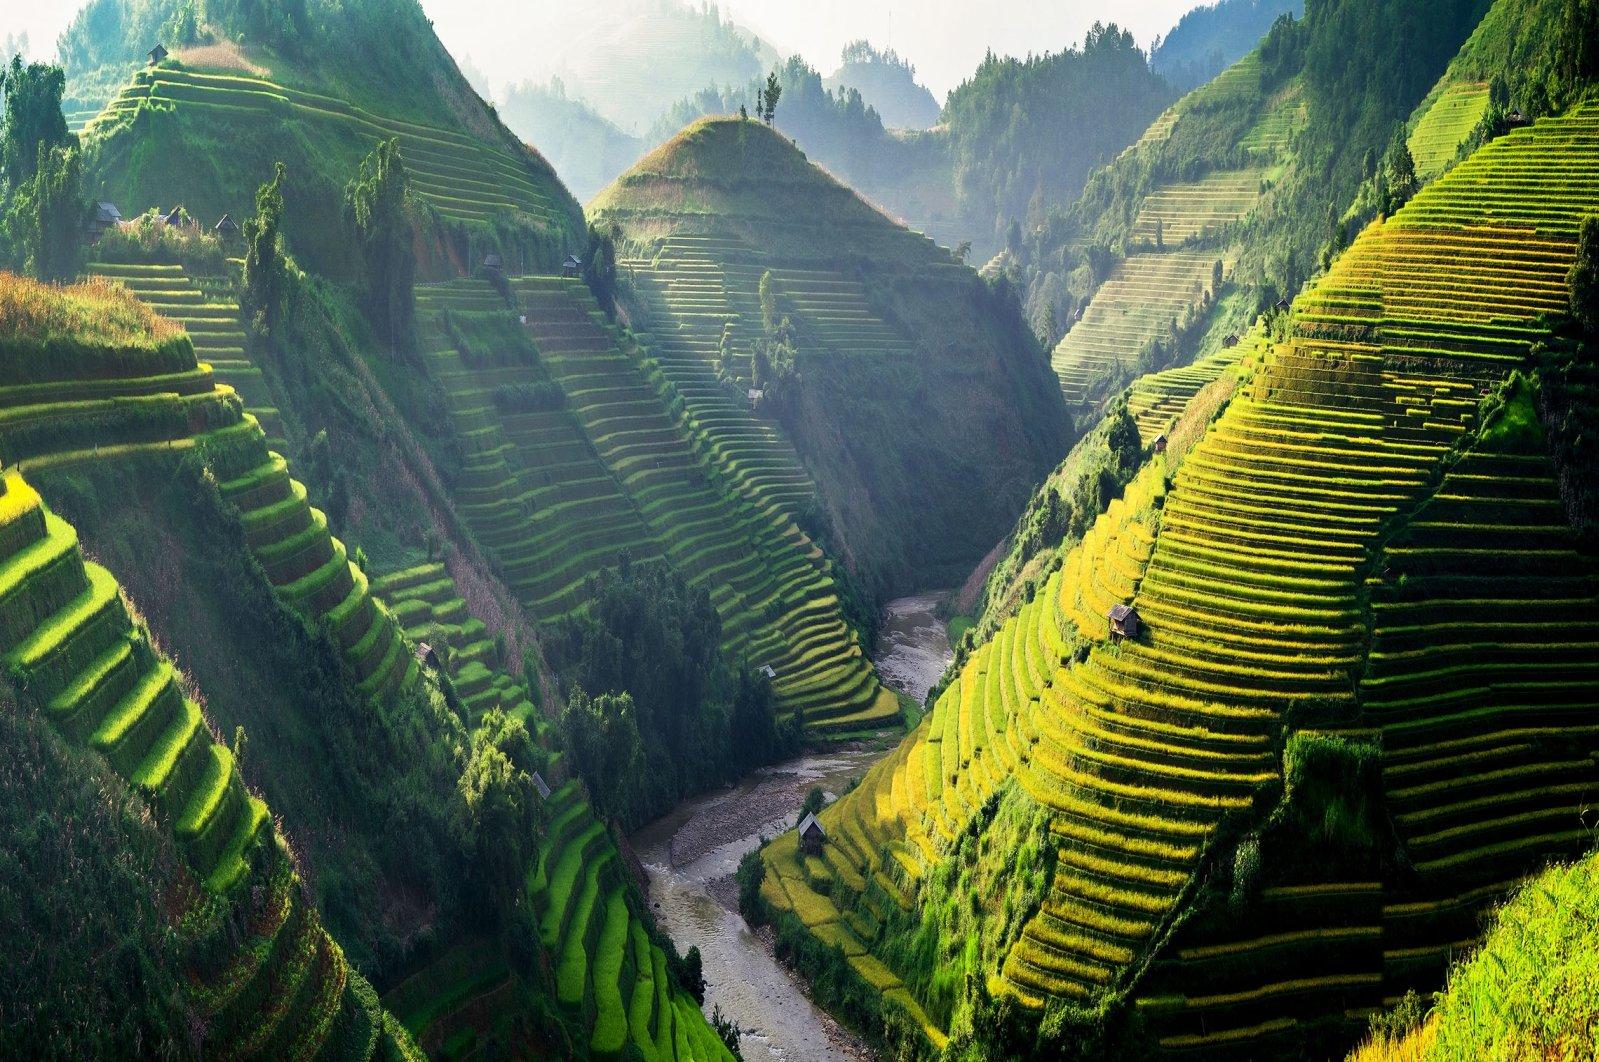 Sun shines onto the terraces of rice fields in northwestern Vietnam. (Shutterstock Photo)